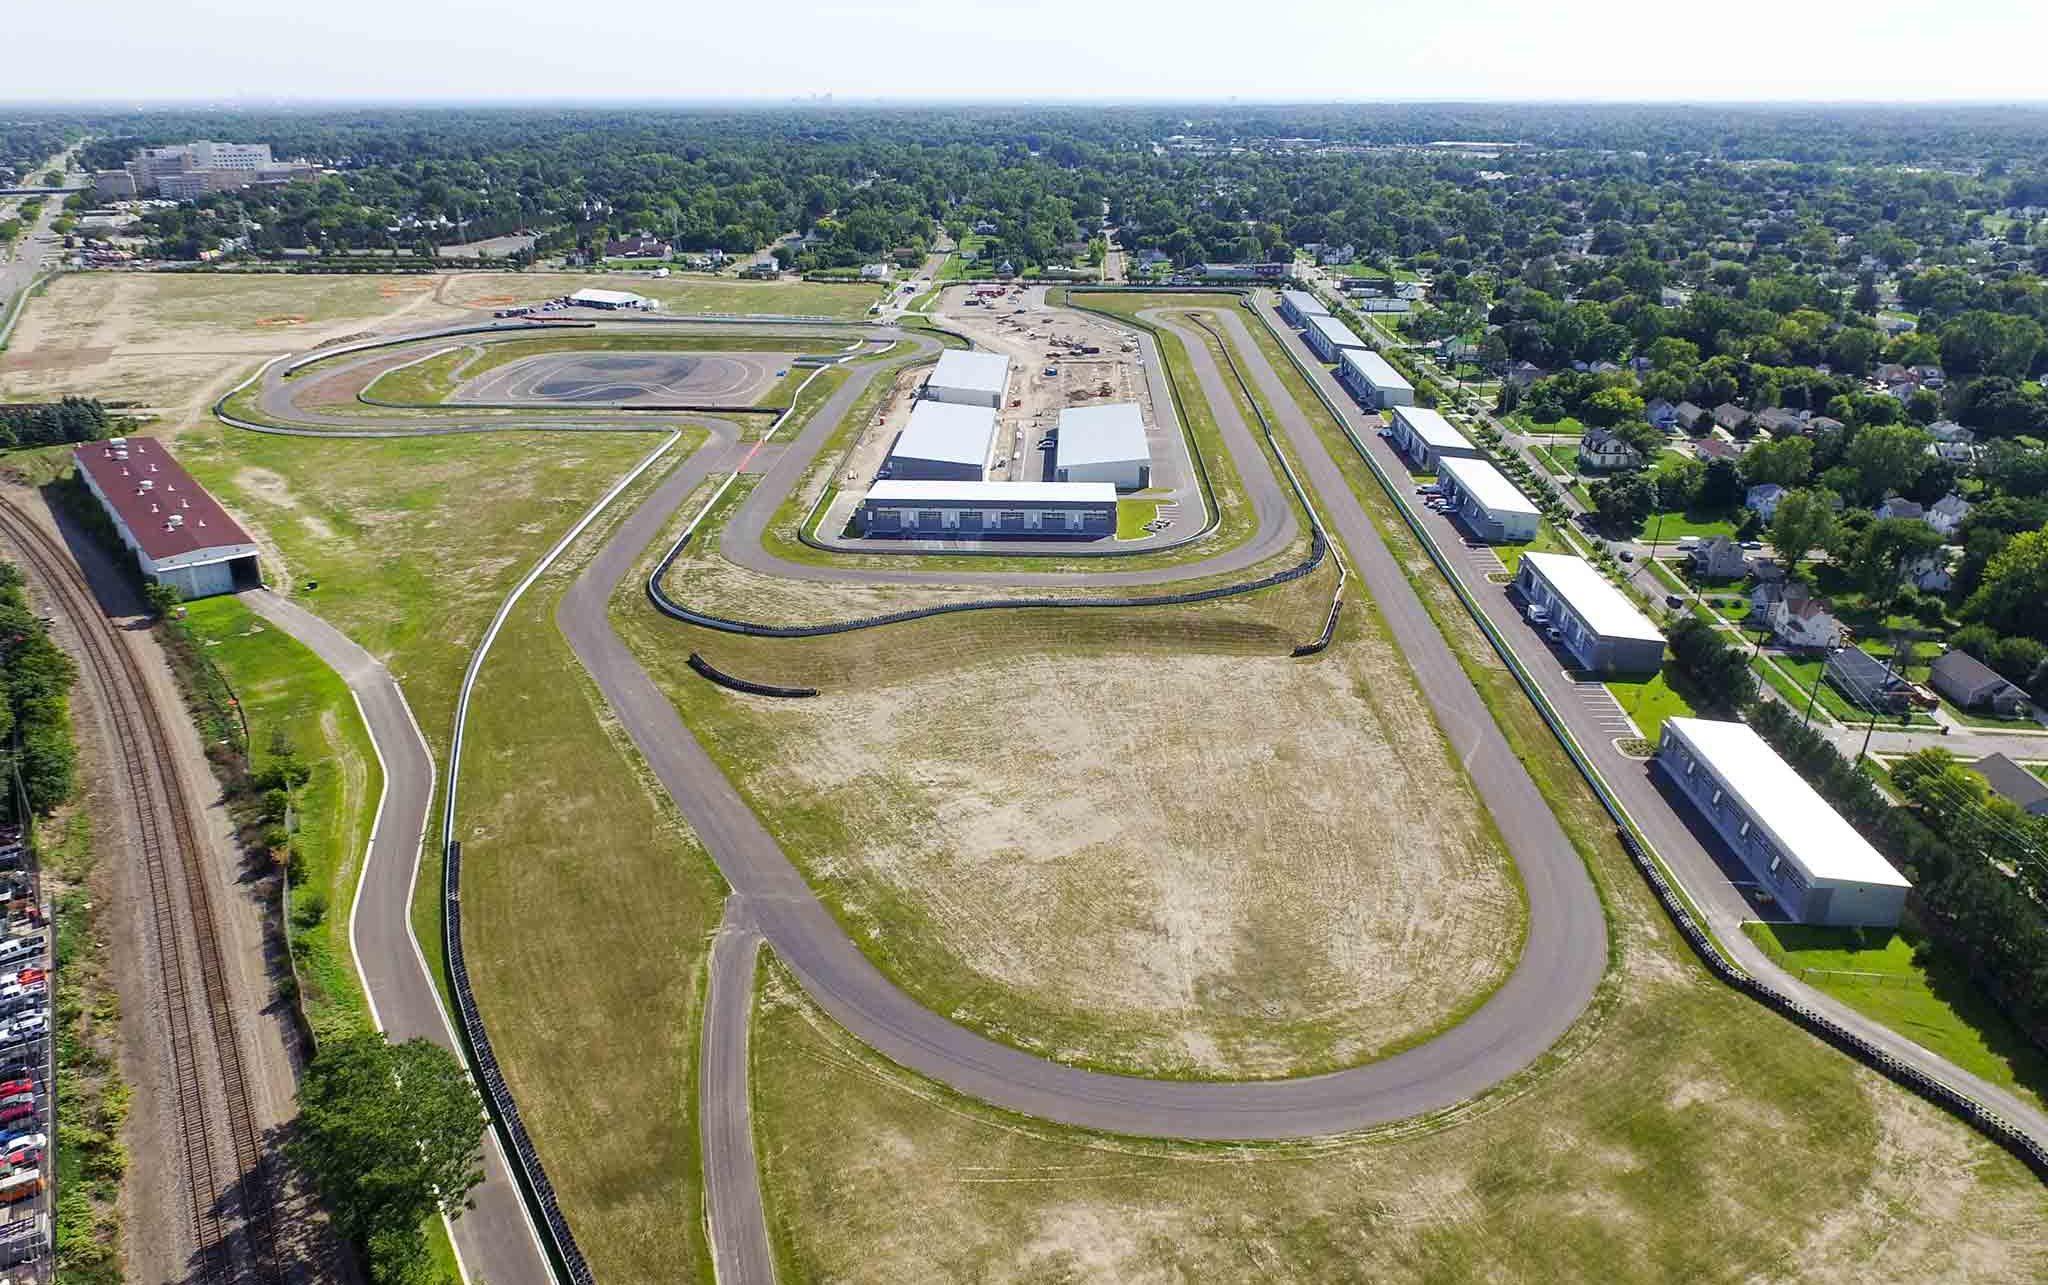 Aerial of track and site at M1 Concourse Car Condos Project in Pontiac Michigan Architecture Interior Design